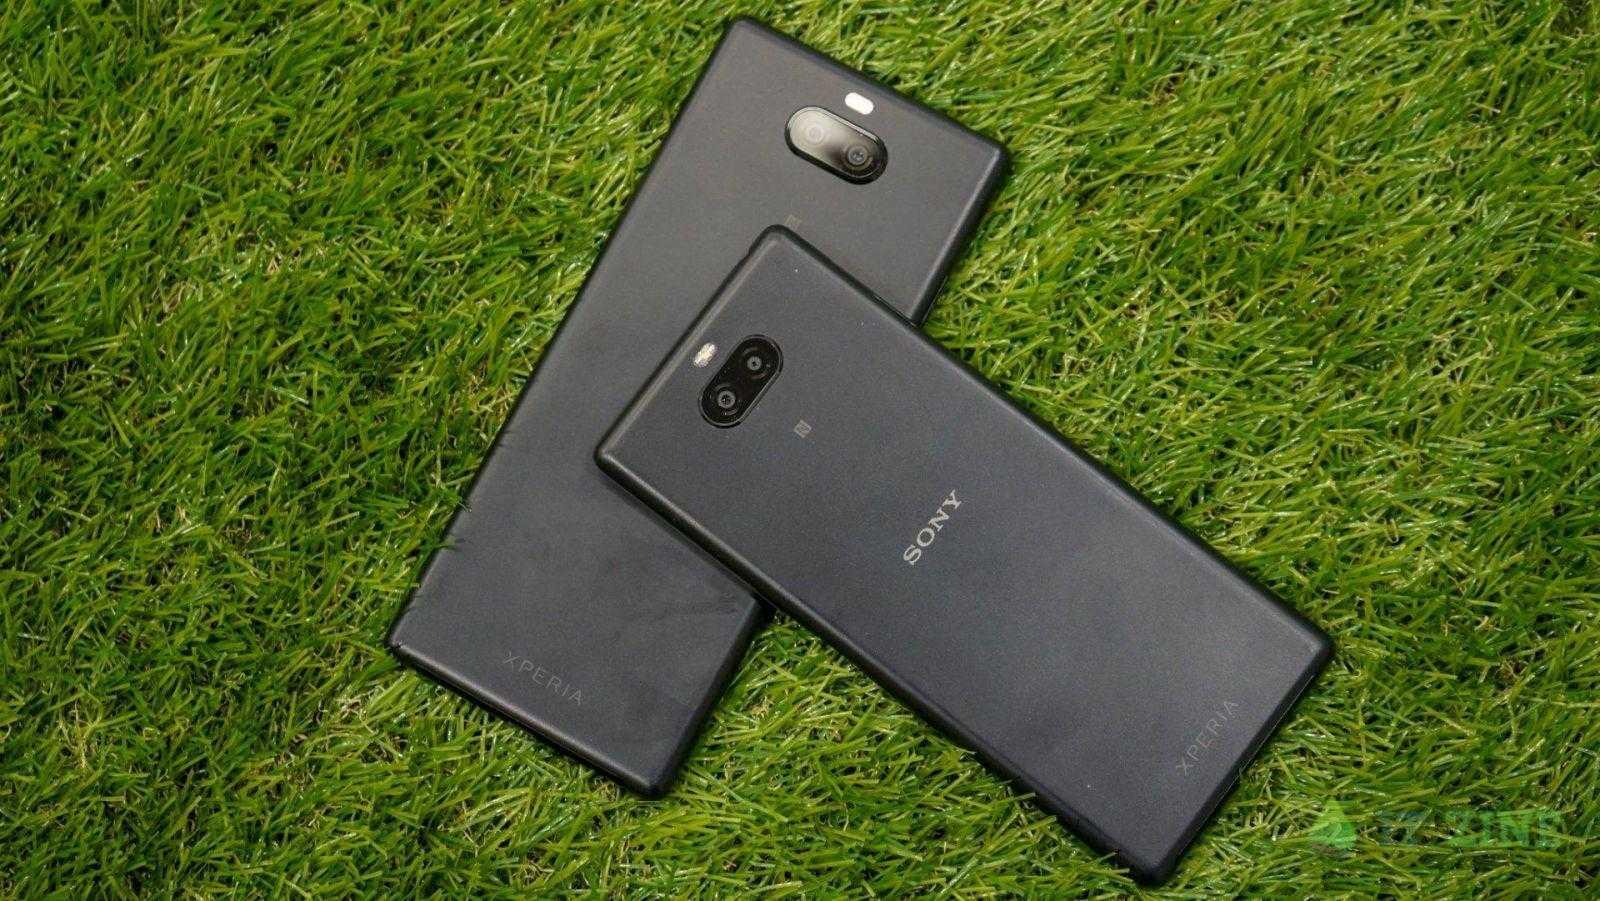 MWC 2019. Sony показала новые смартфоны среднего сегмента Xperia 10 и 10 Plus (DSC05473)